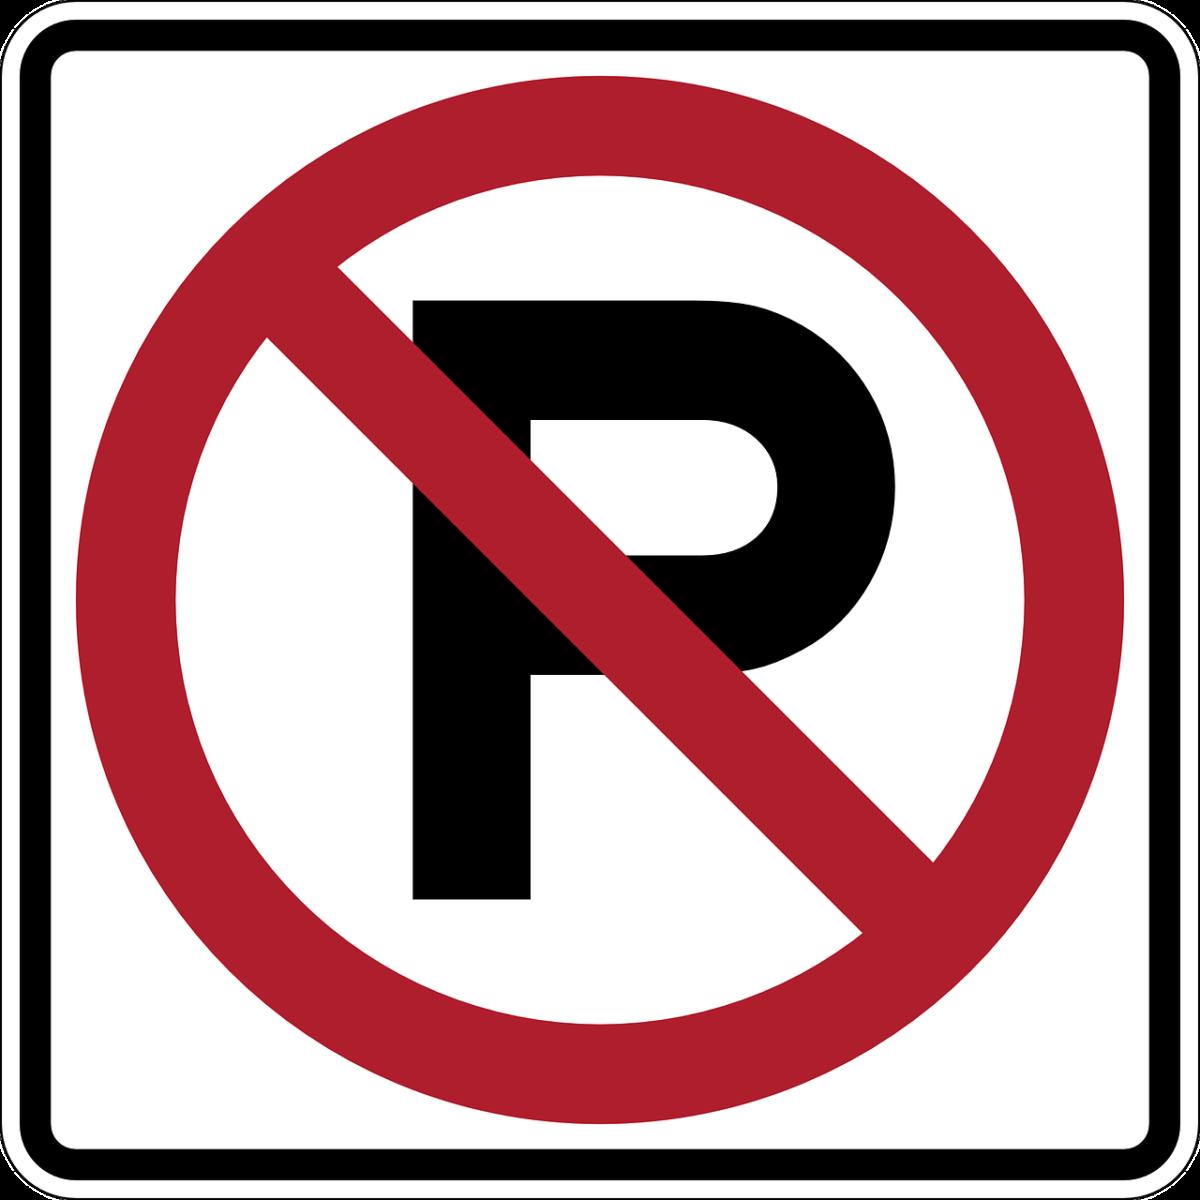 490388dd25cc2176535e_No_parking.jpg